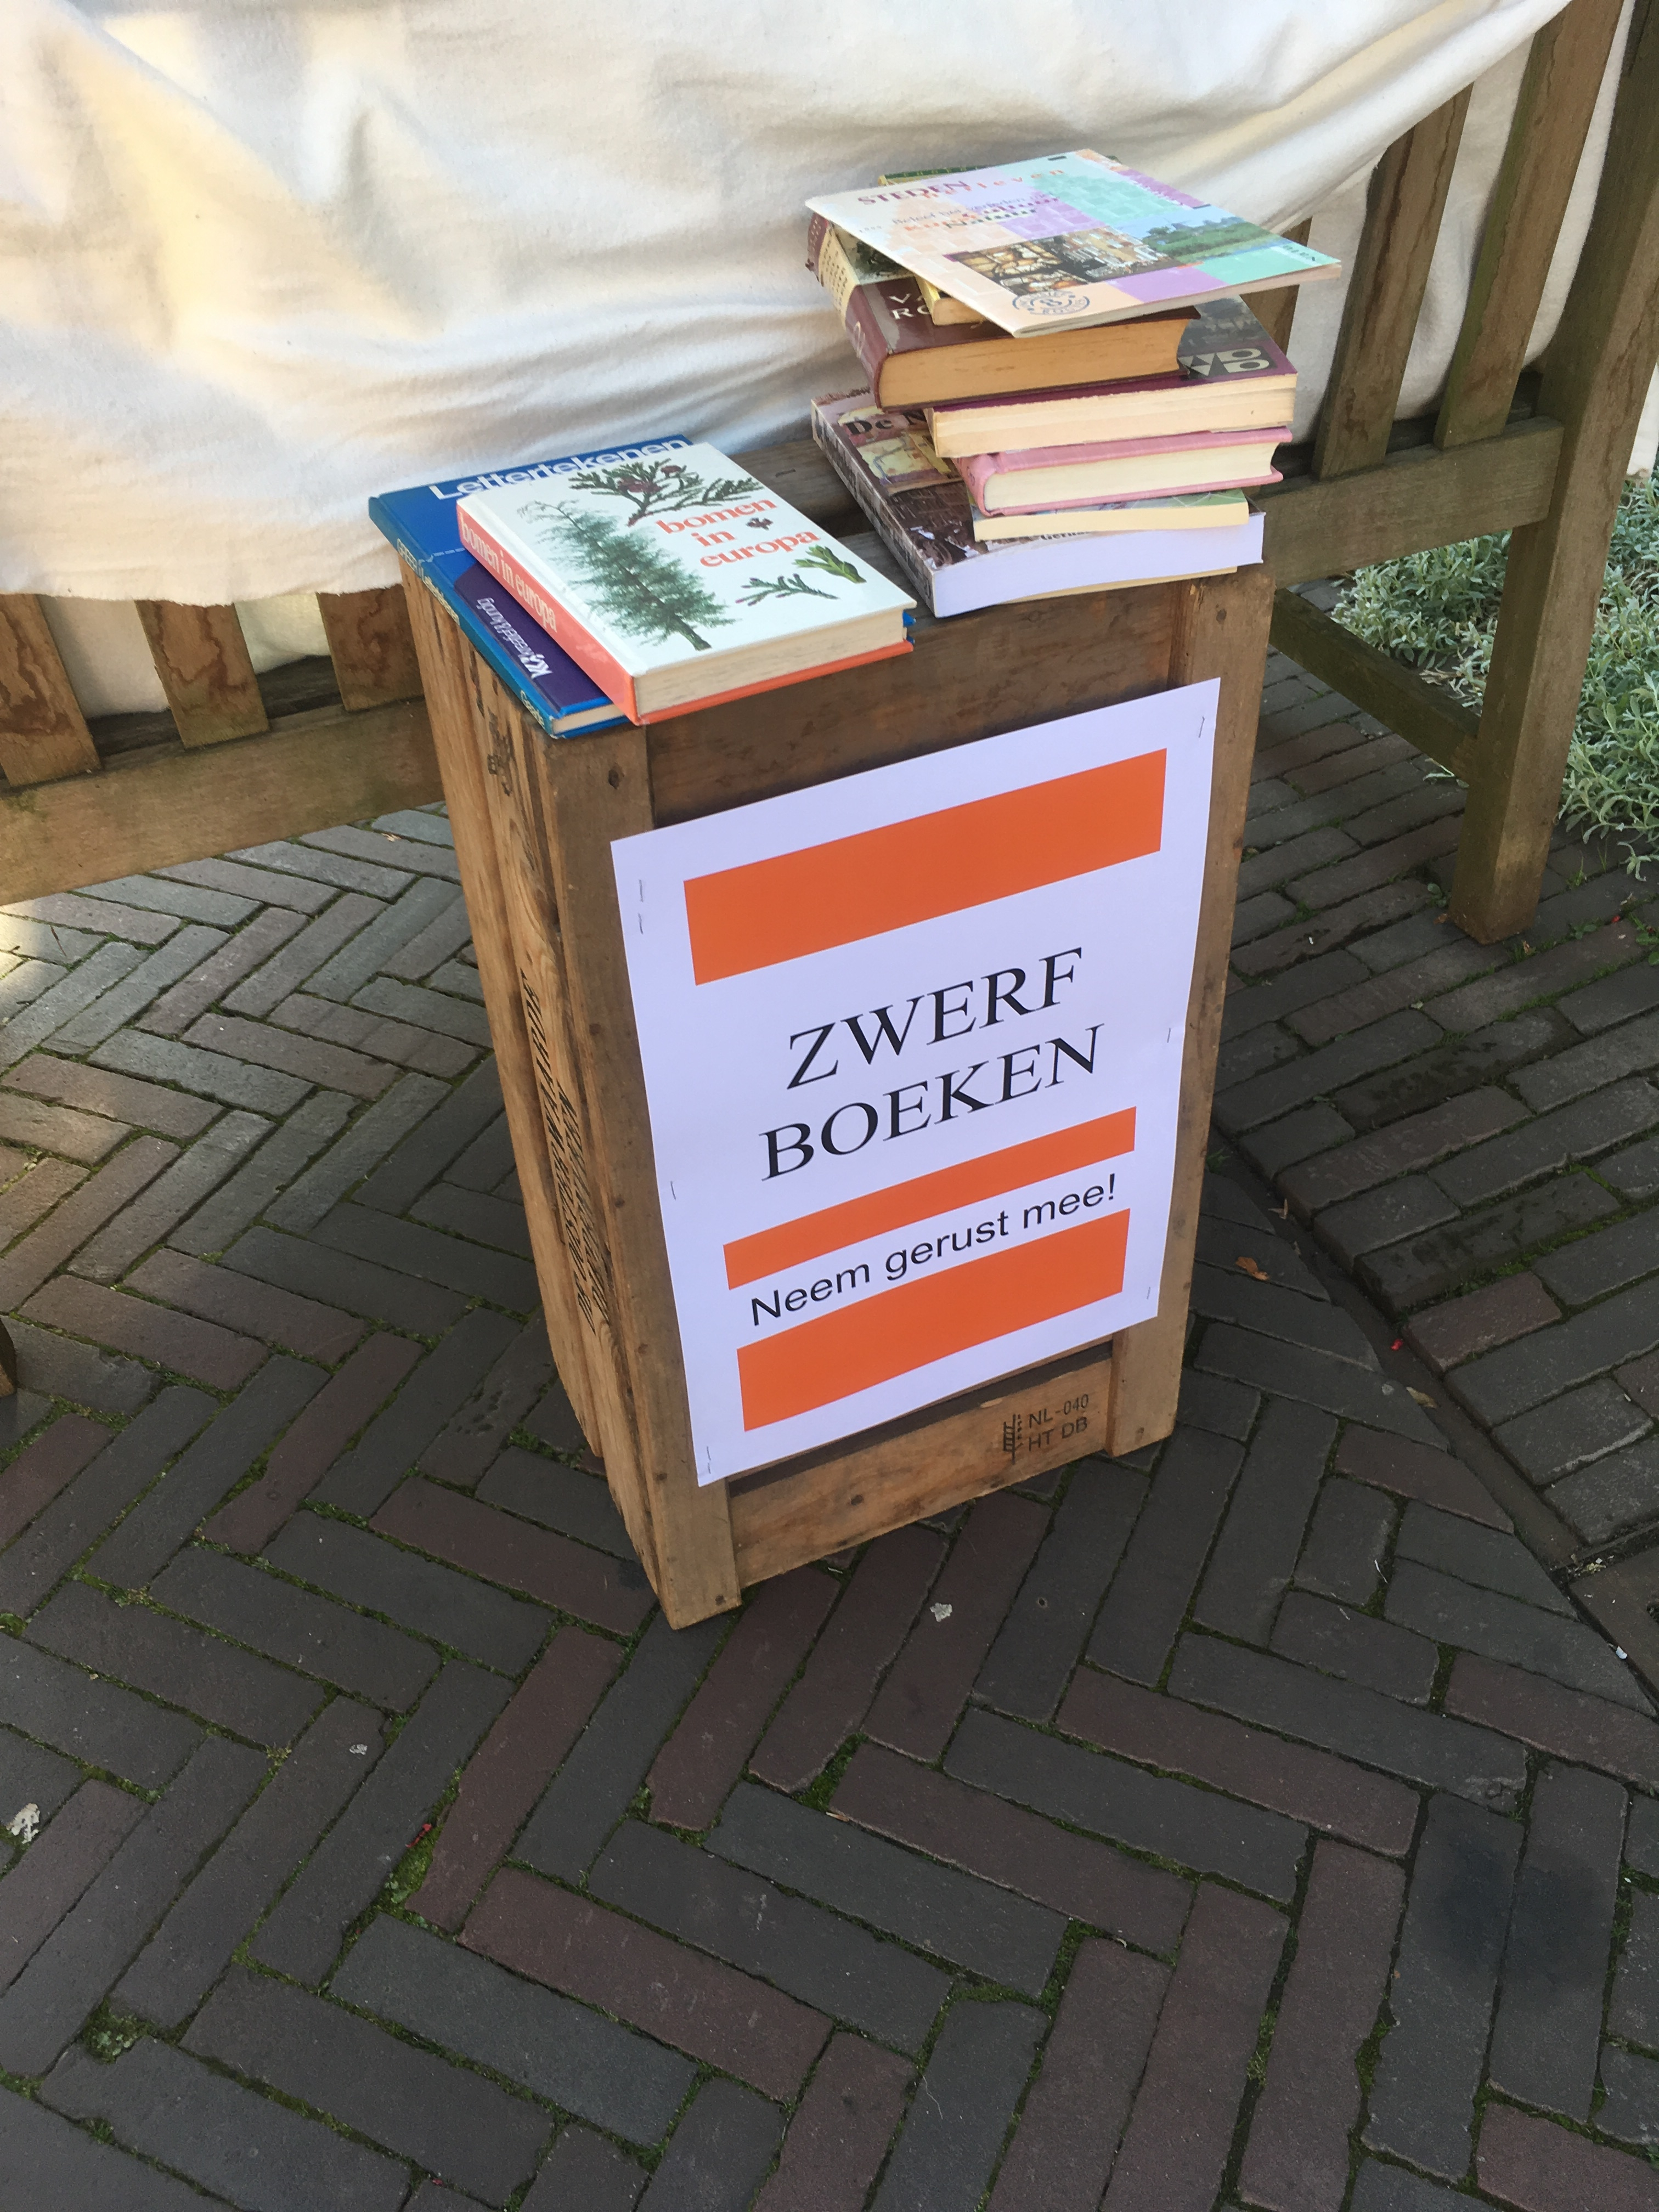 Zwerfboeken in kader opening bieb